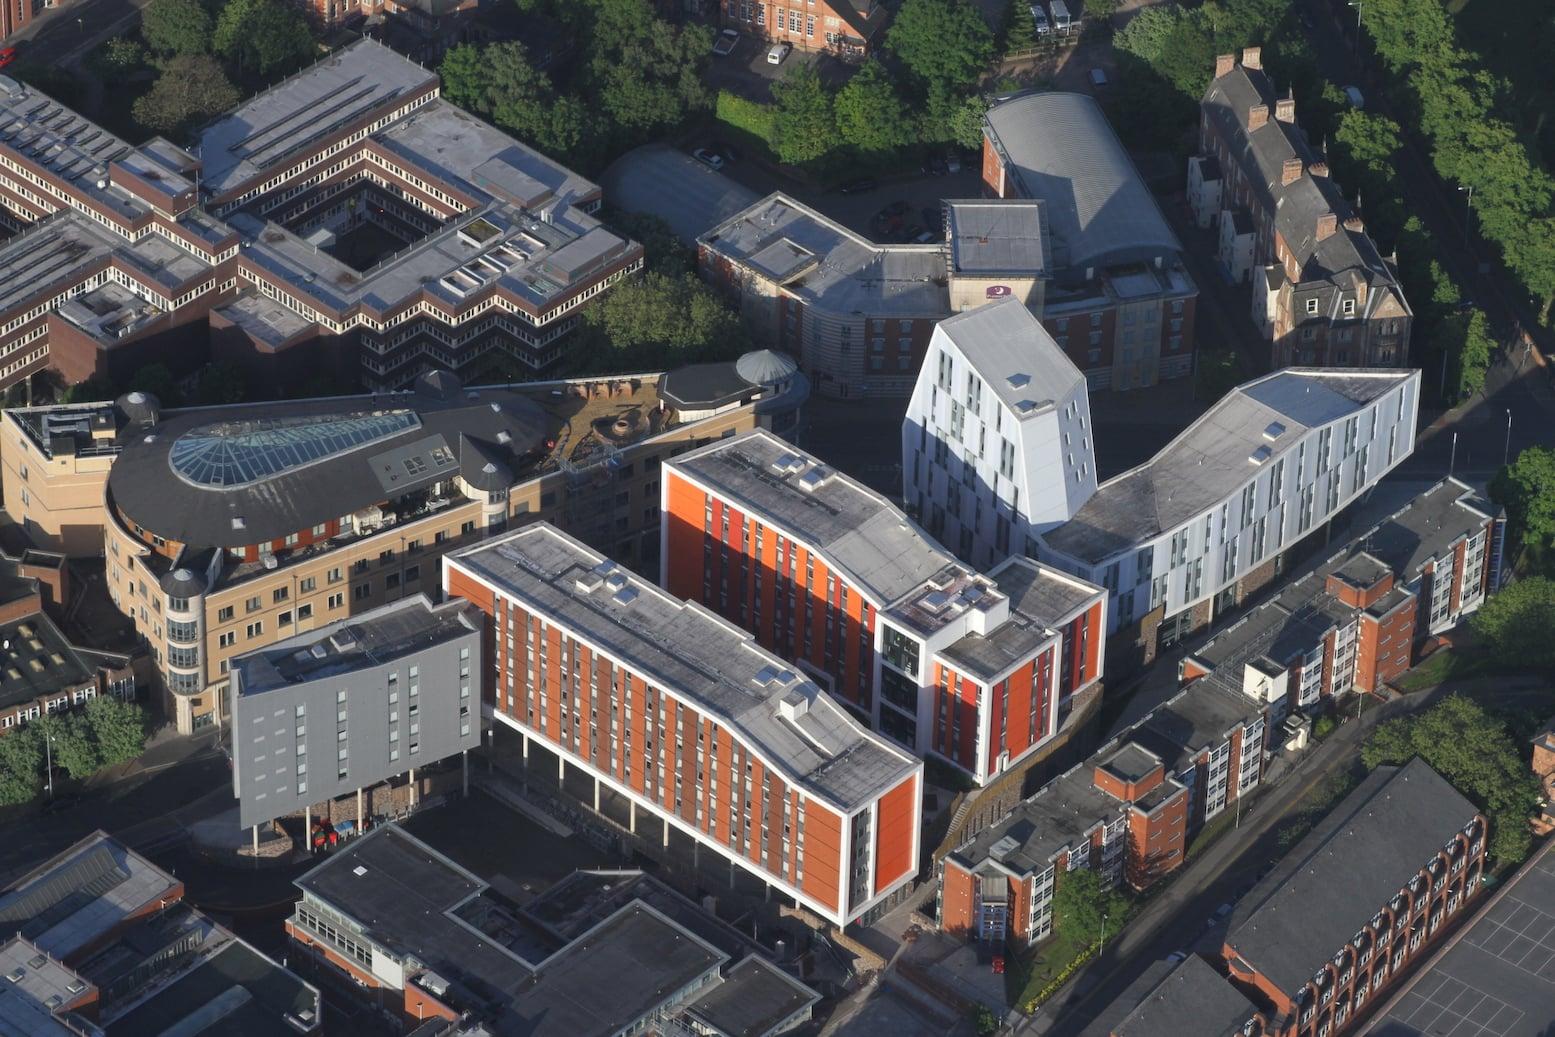 Nottingham Trent University buildings at jn of Shakespeare St & Goldsmith St - photo Robin Macey